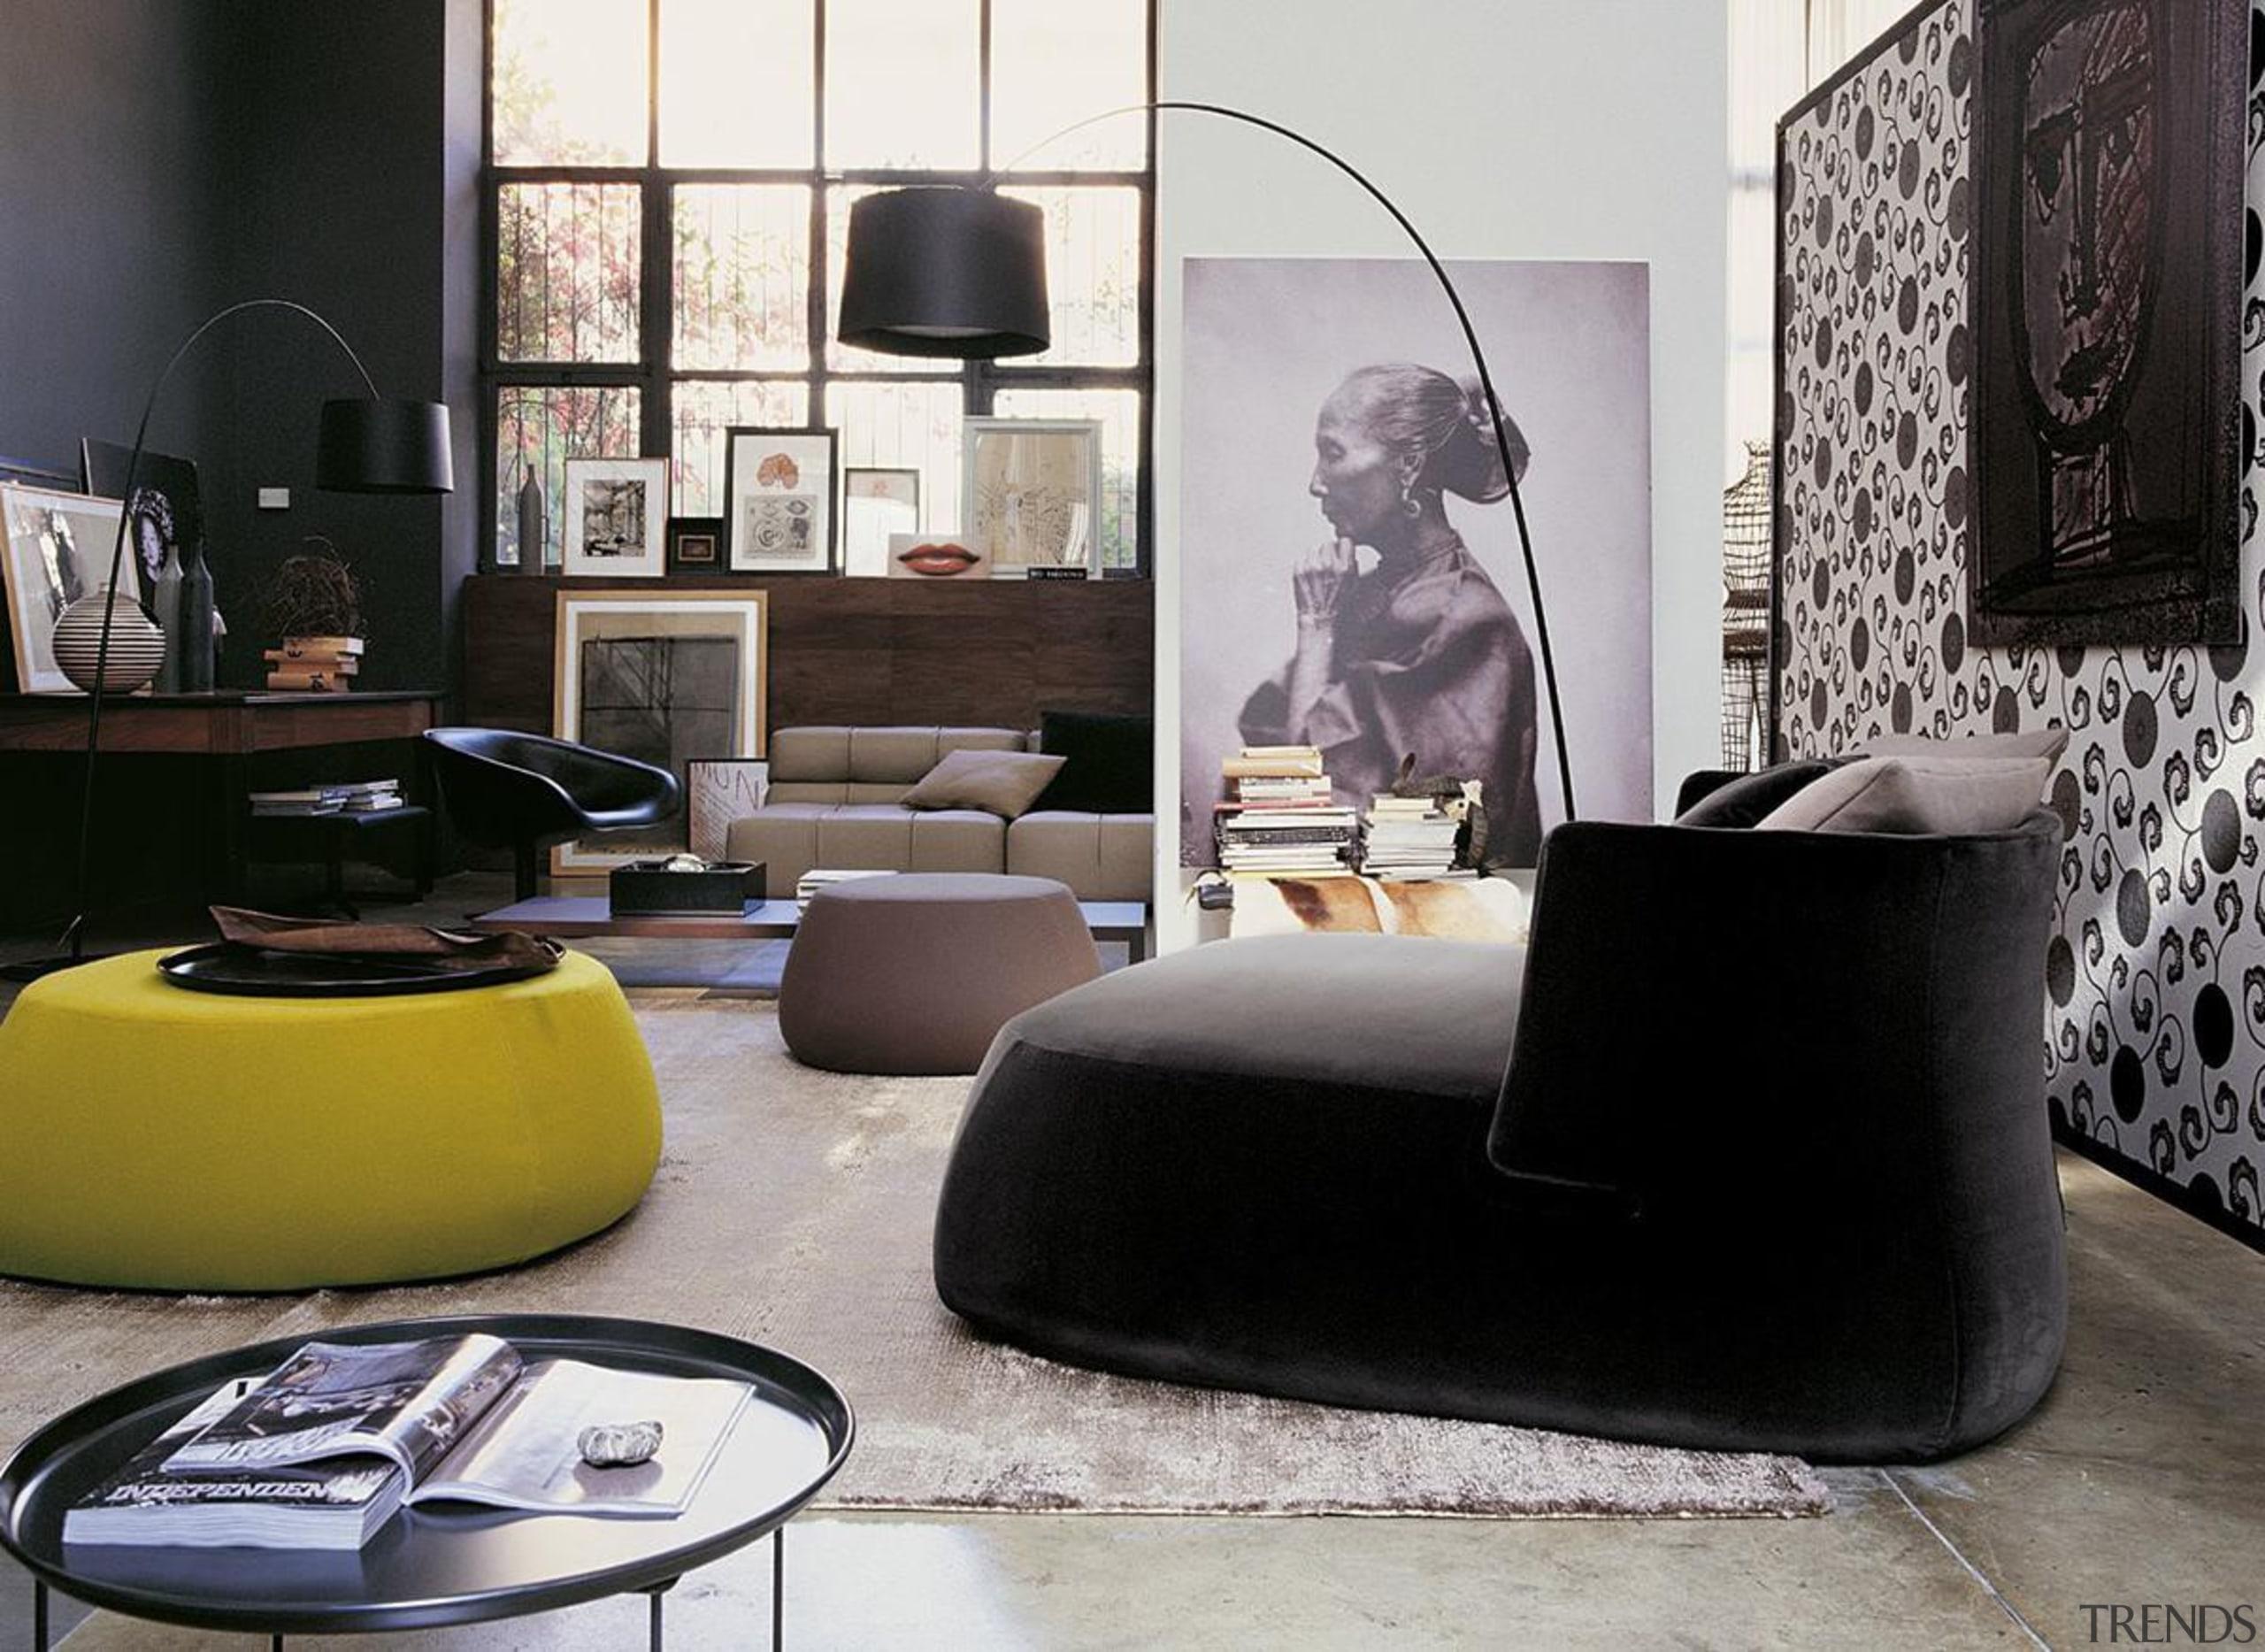 bebitaliaurquiolafatsofasofablackinstu1200.jpg - bebitaliaurquiolafatsofasofablackinstu1200.jpg - chair | couch | chair, couch, floor, flooring, furniture, interior design, lamp, light fixture, lighting, living room, product design, room, table, black, gray